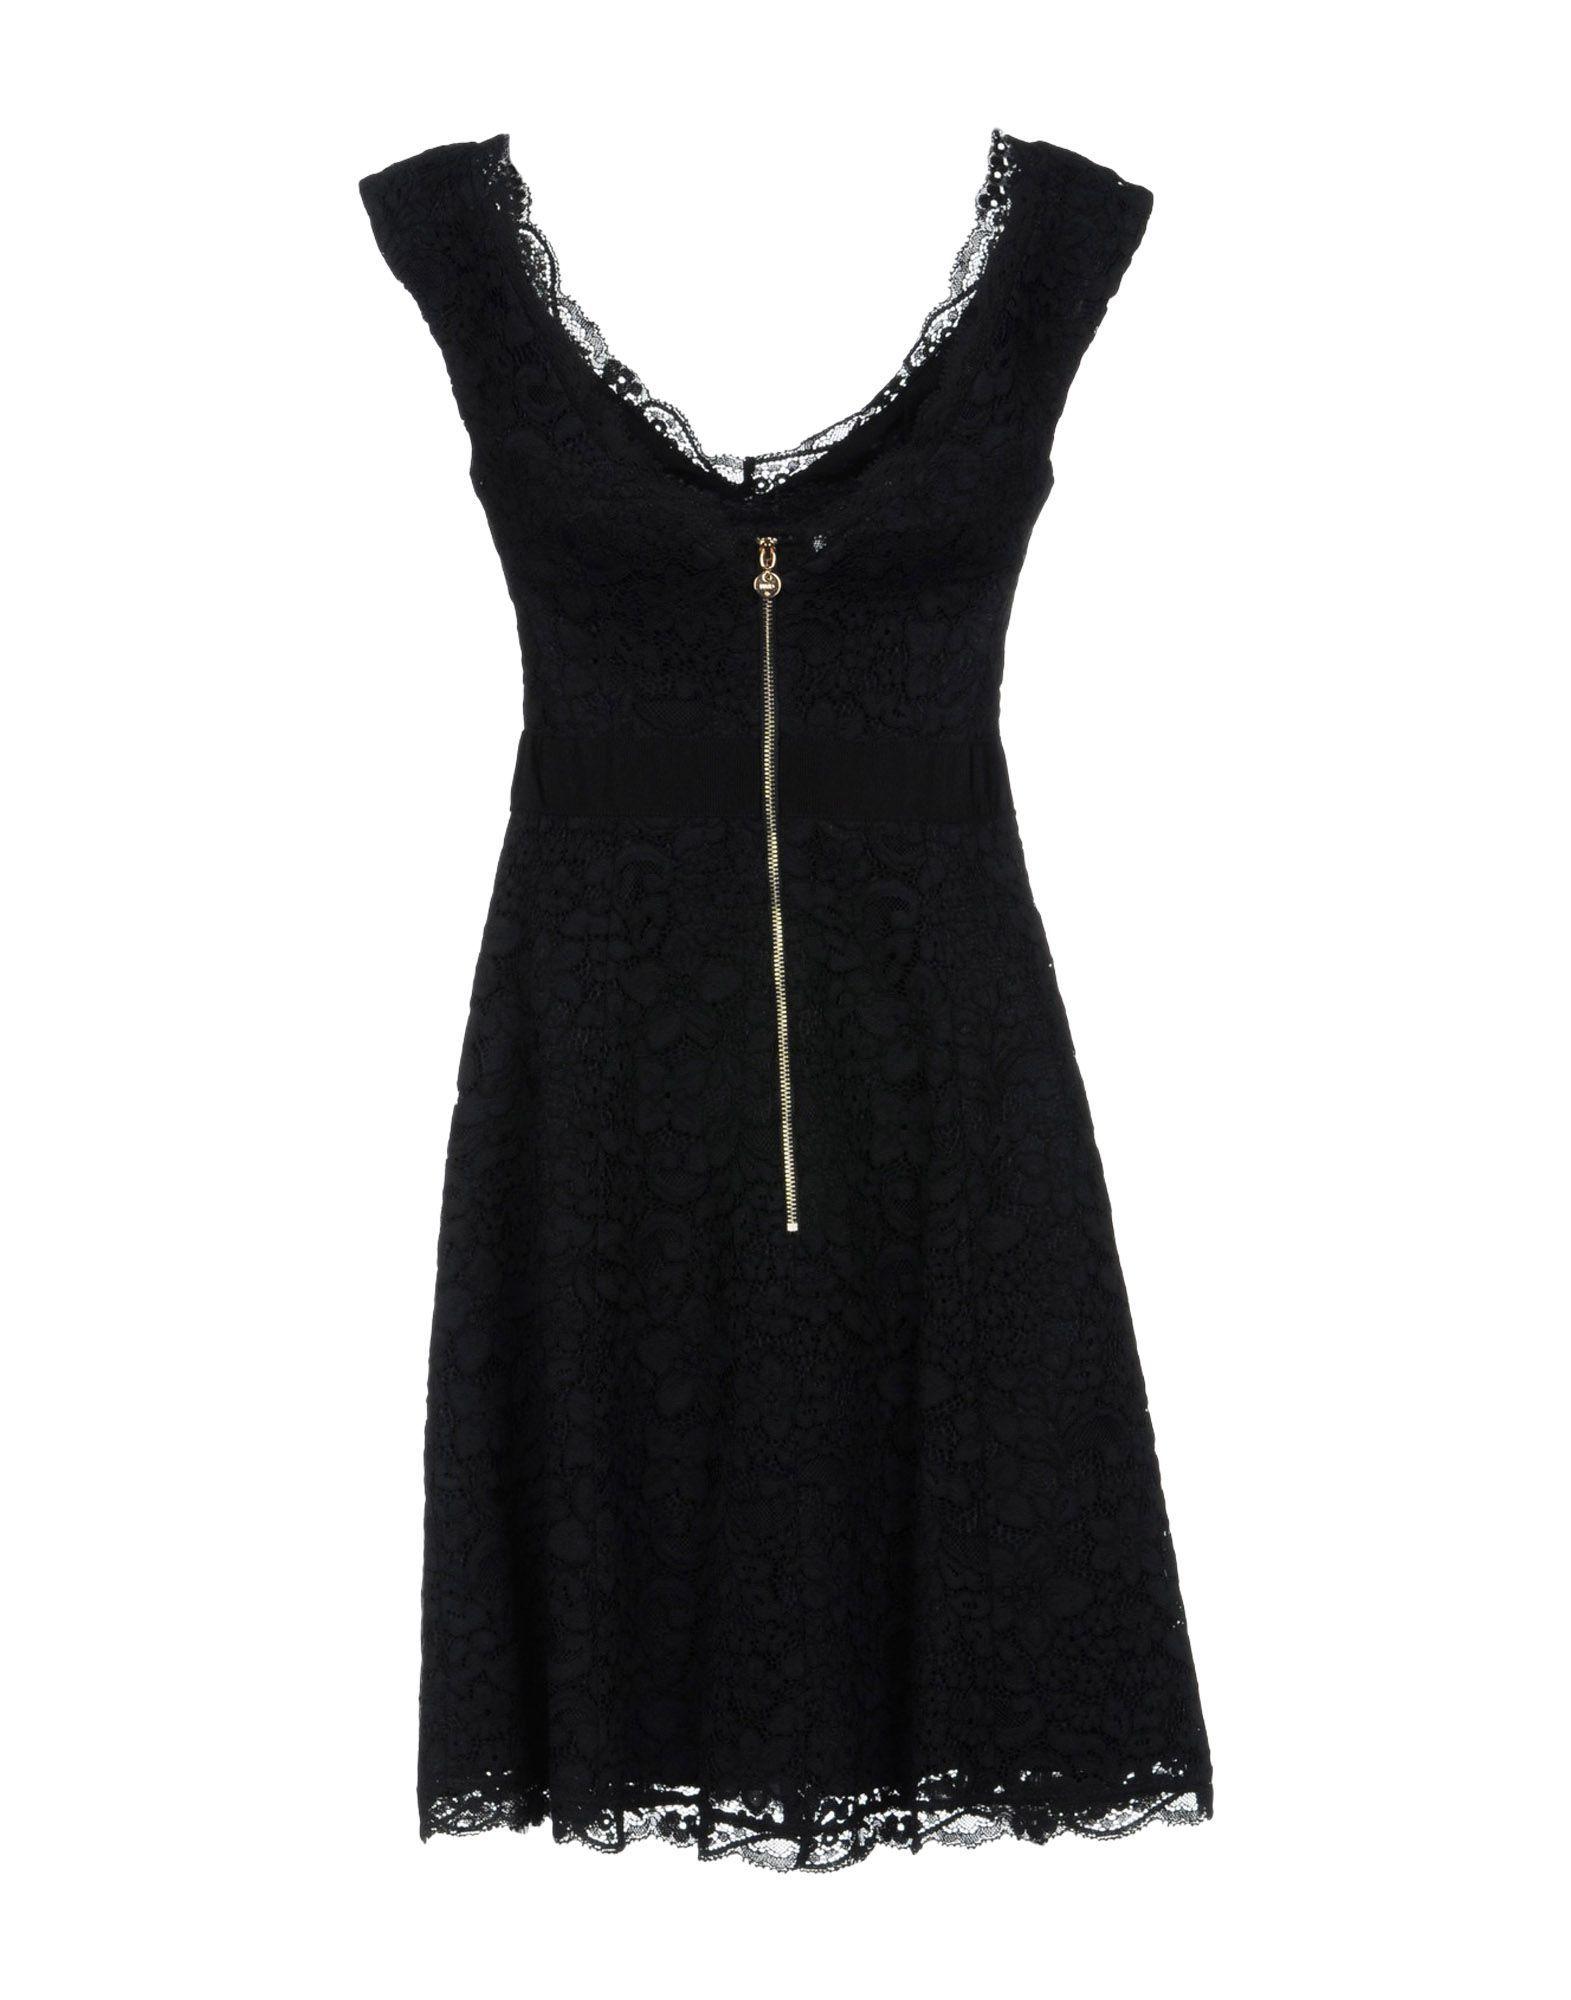 Liu Jo Black Cotton Dress